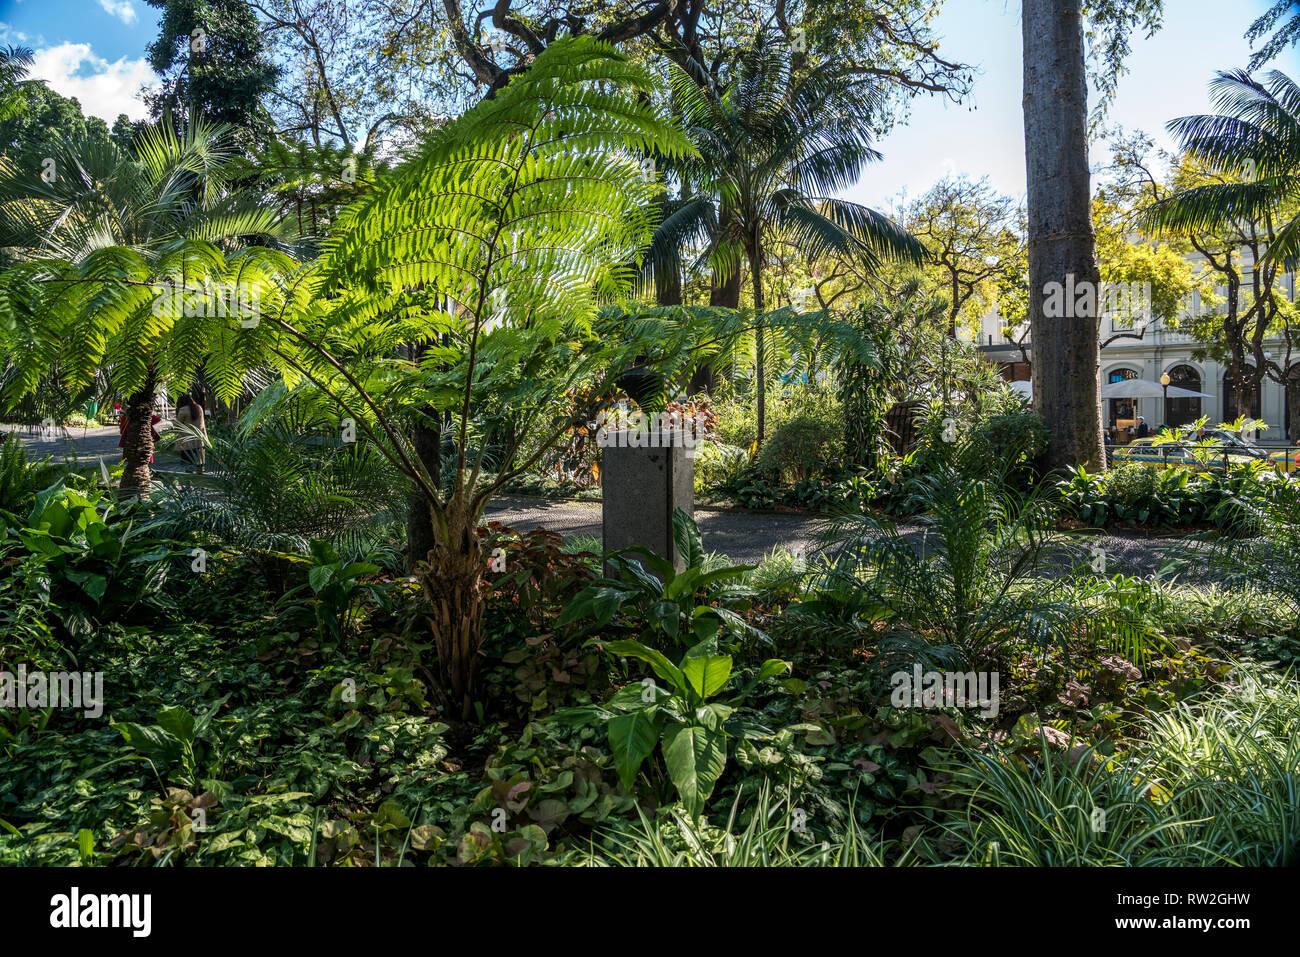 Farn im Stadtpark Jardim Municipal do Funchal, Funchal, Madeira, Portugal, Europa | Farn im Park Jardim Municipal, Funchal, Madeira, Portugal, Eu Stockbild